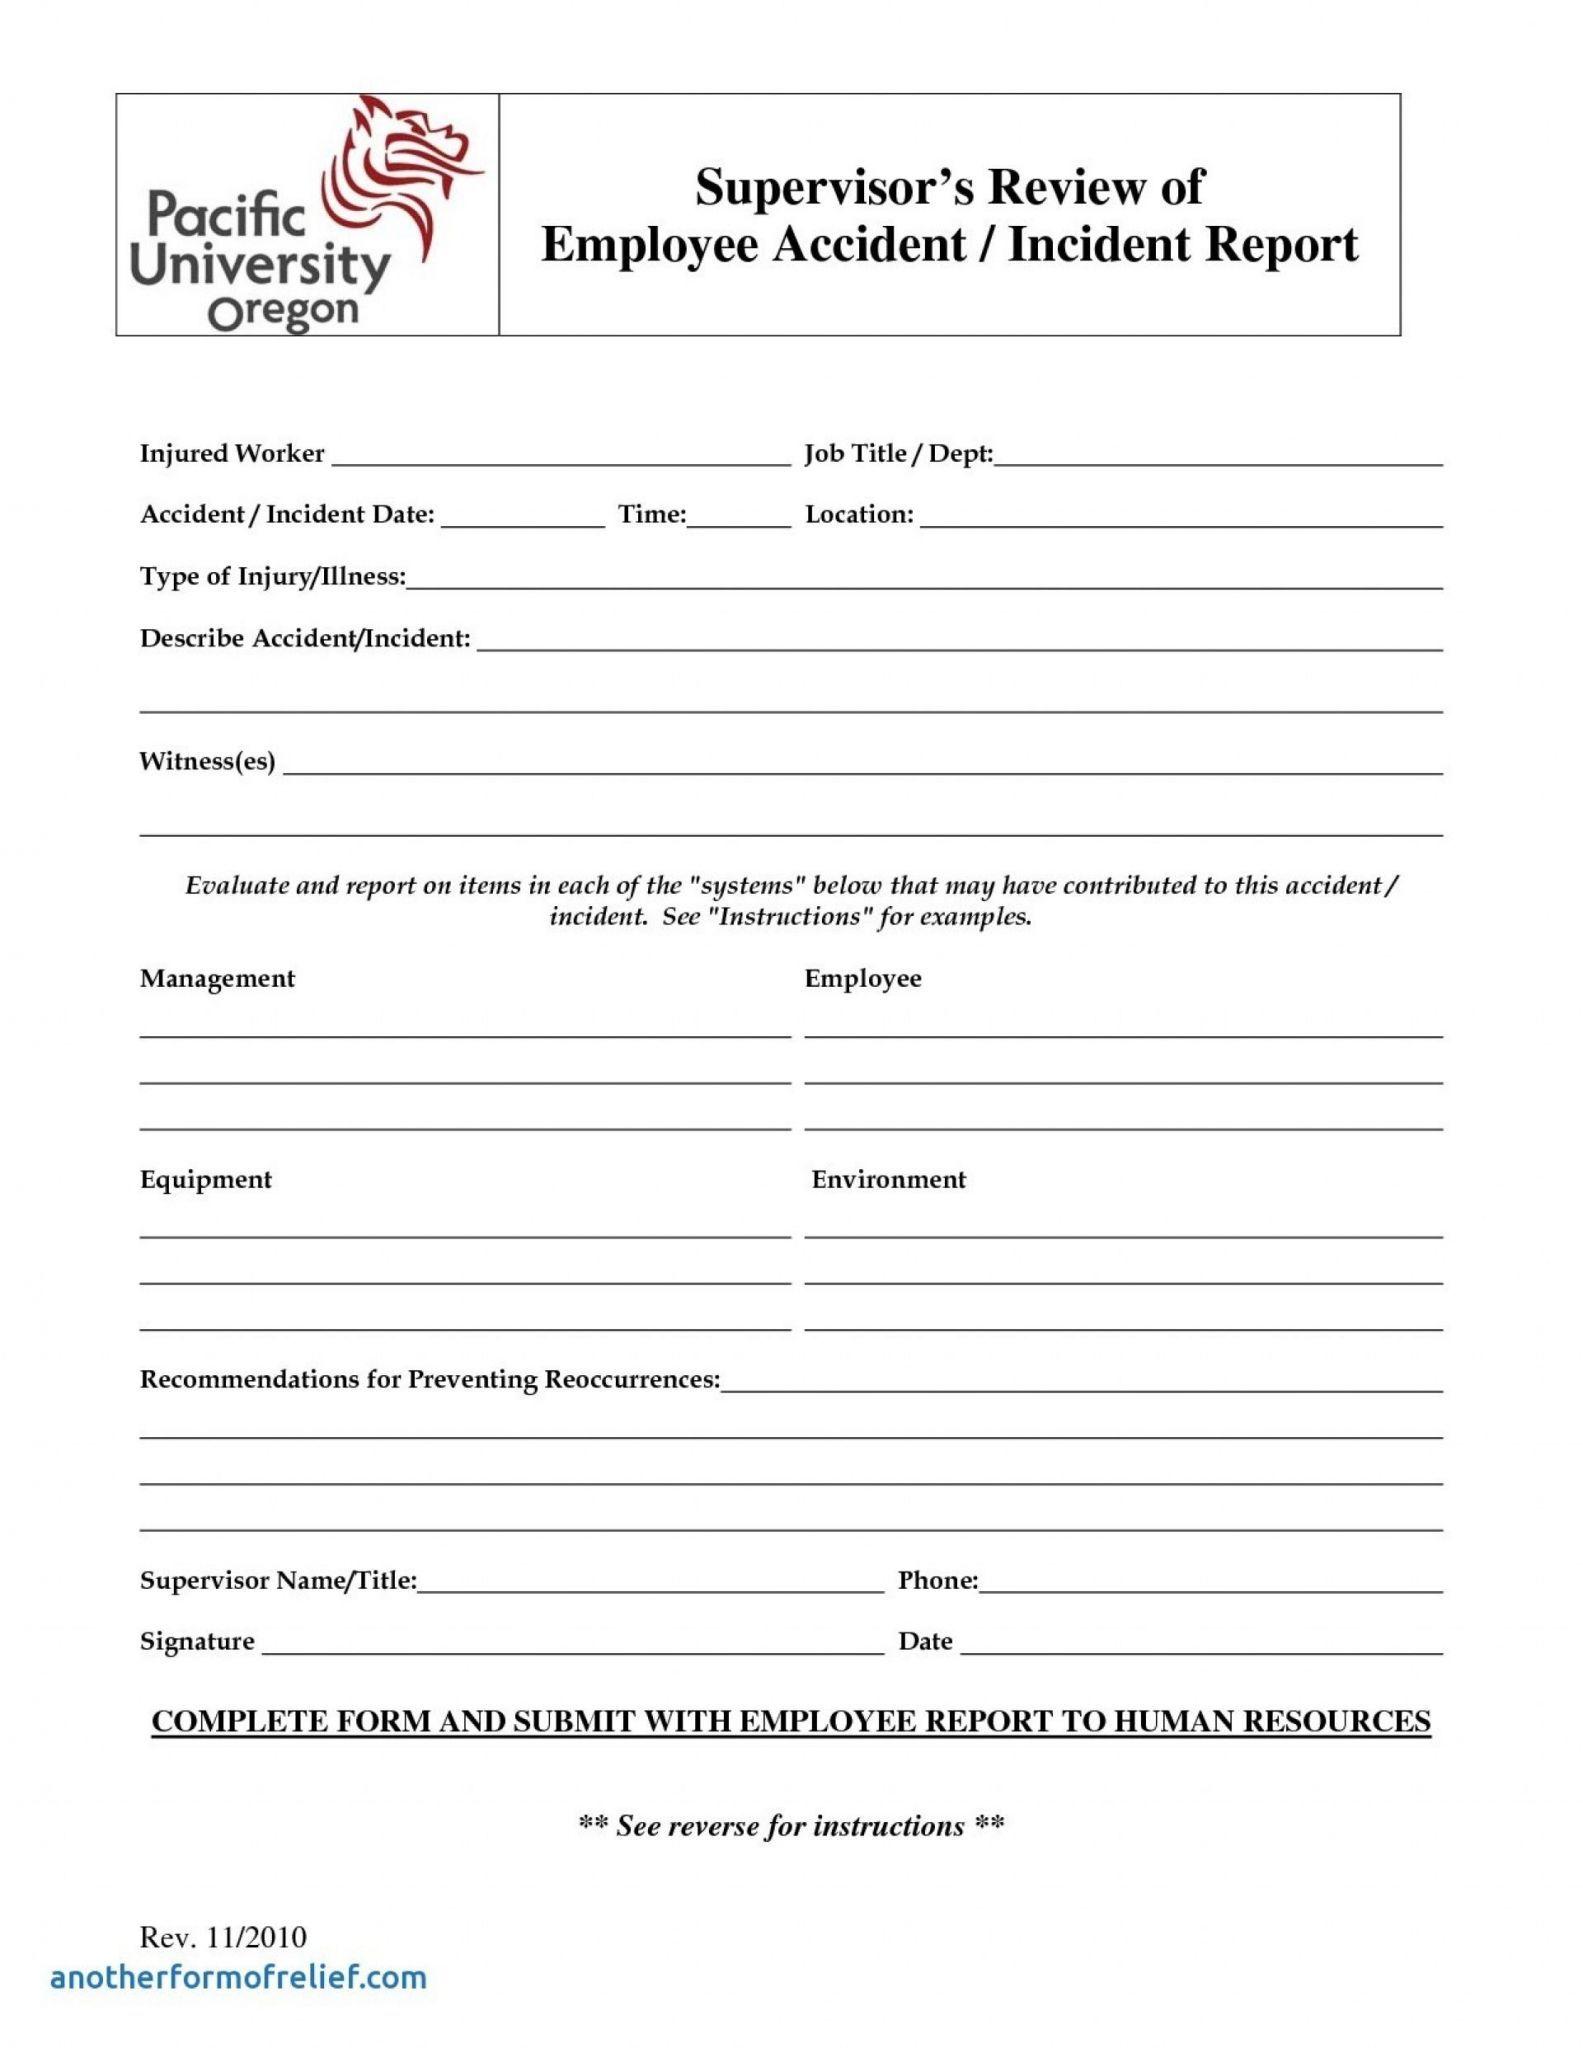 Generic Incident Report Template New Hr Form Manqal Hellenes Co